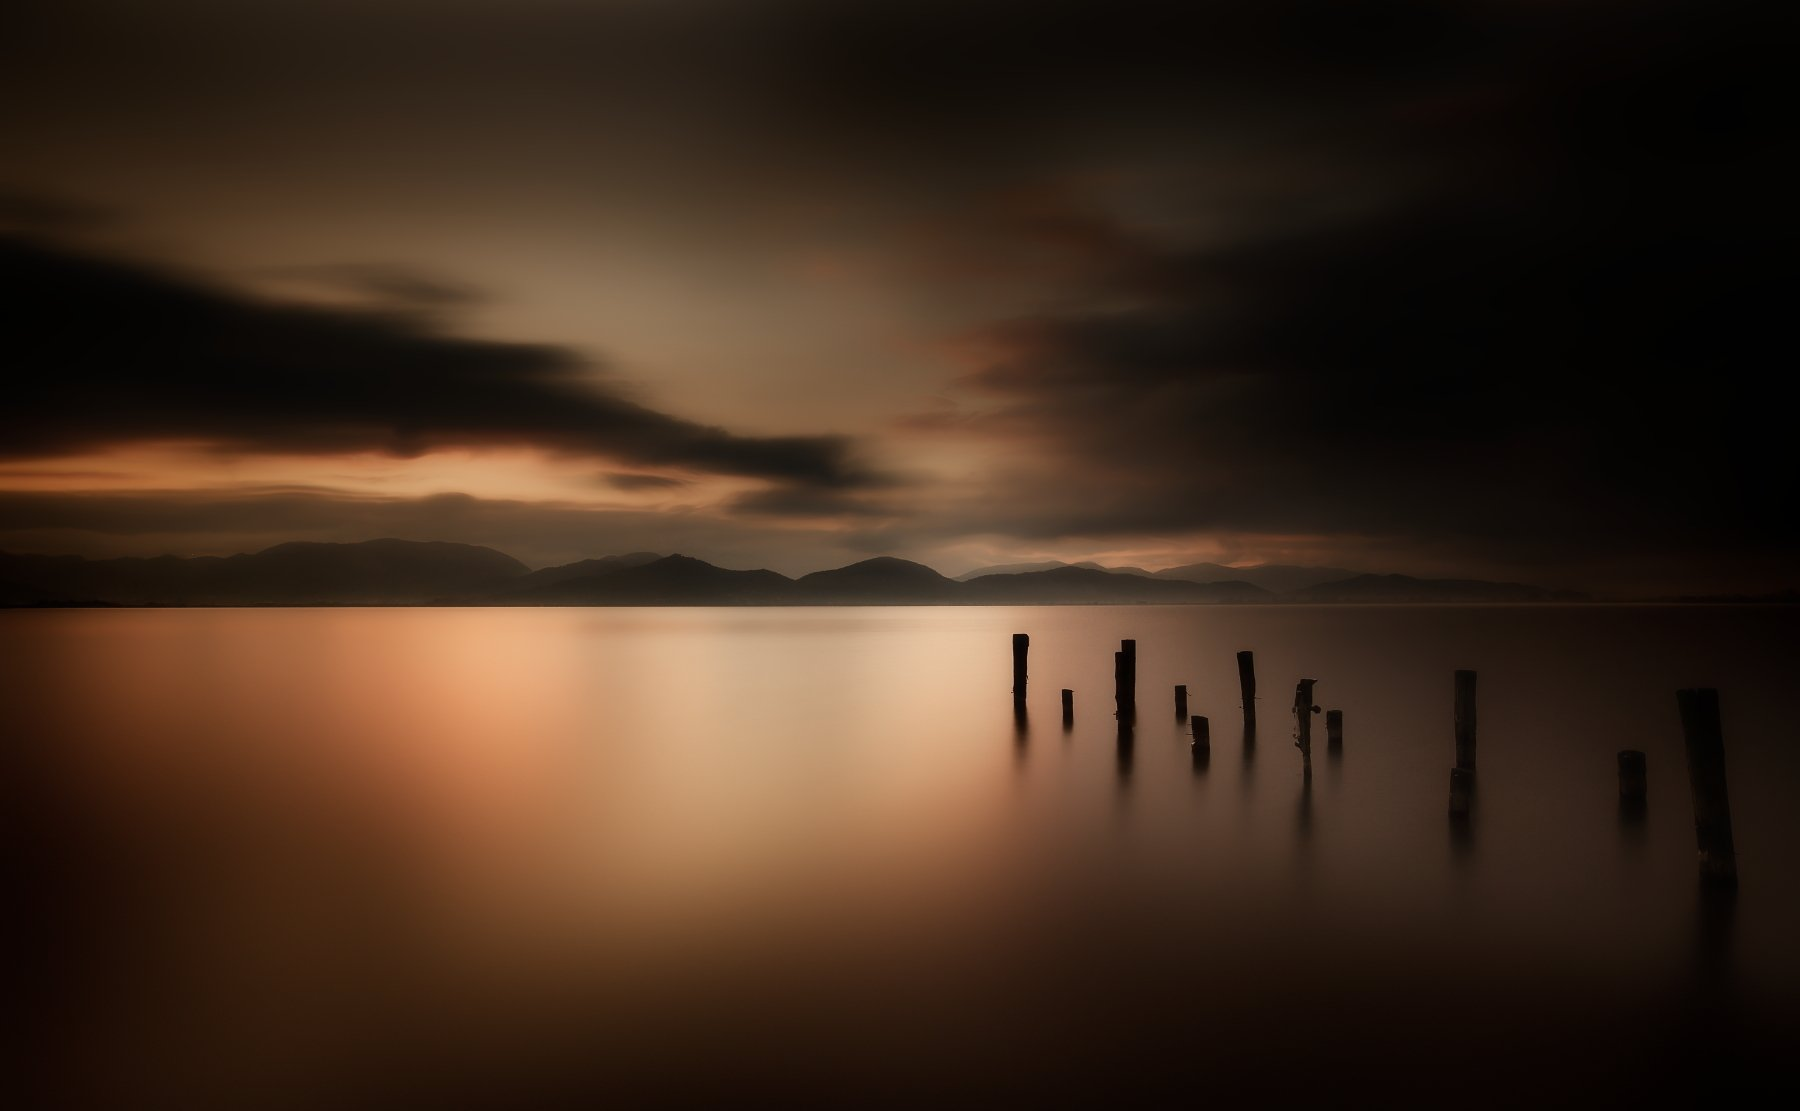 landscape sunrise long exposition, Silvano Sil Passalacqua